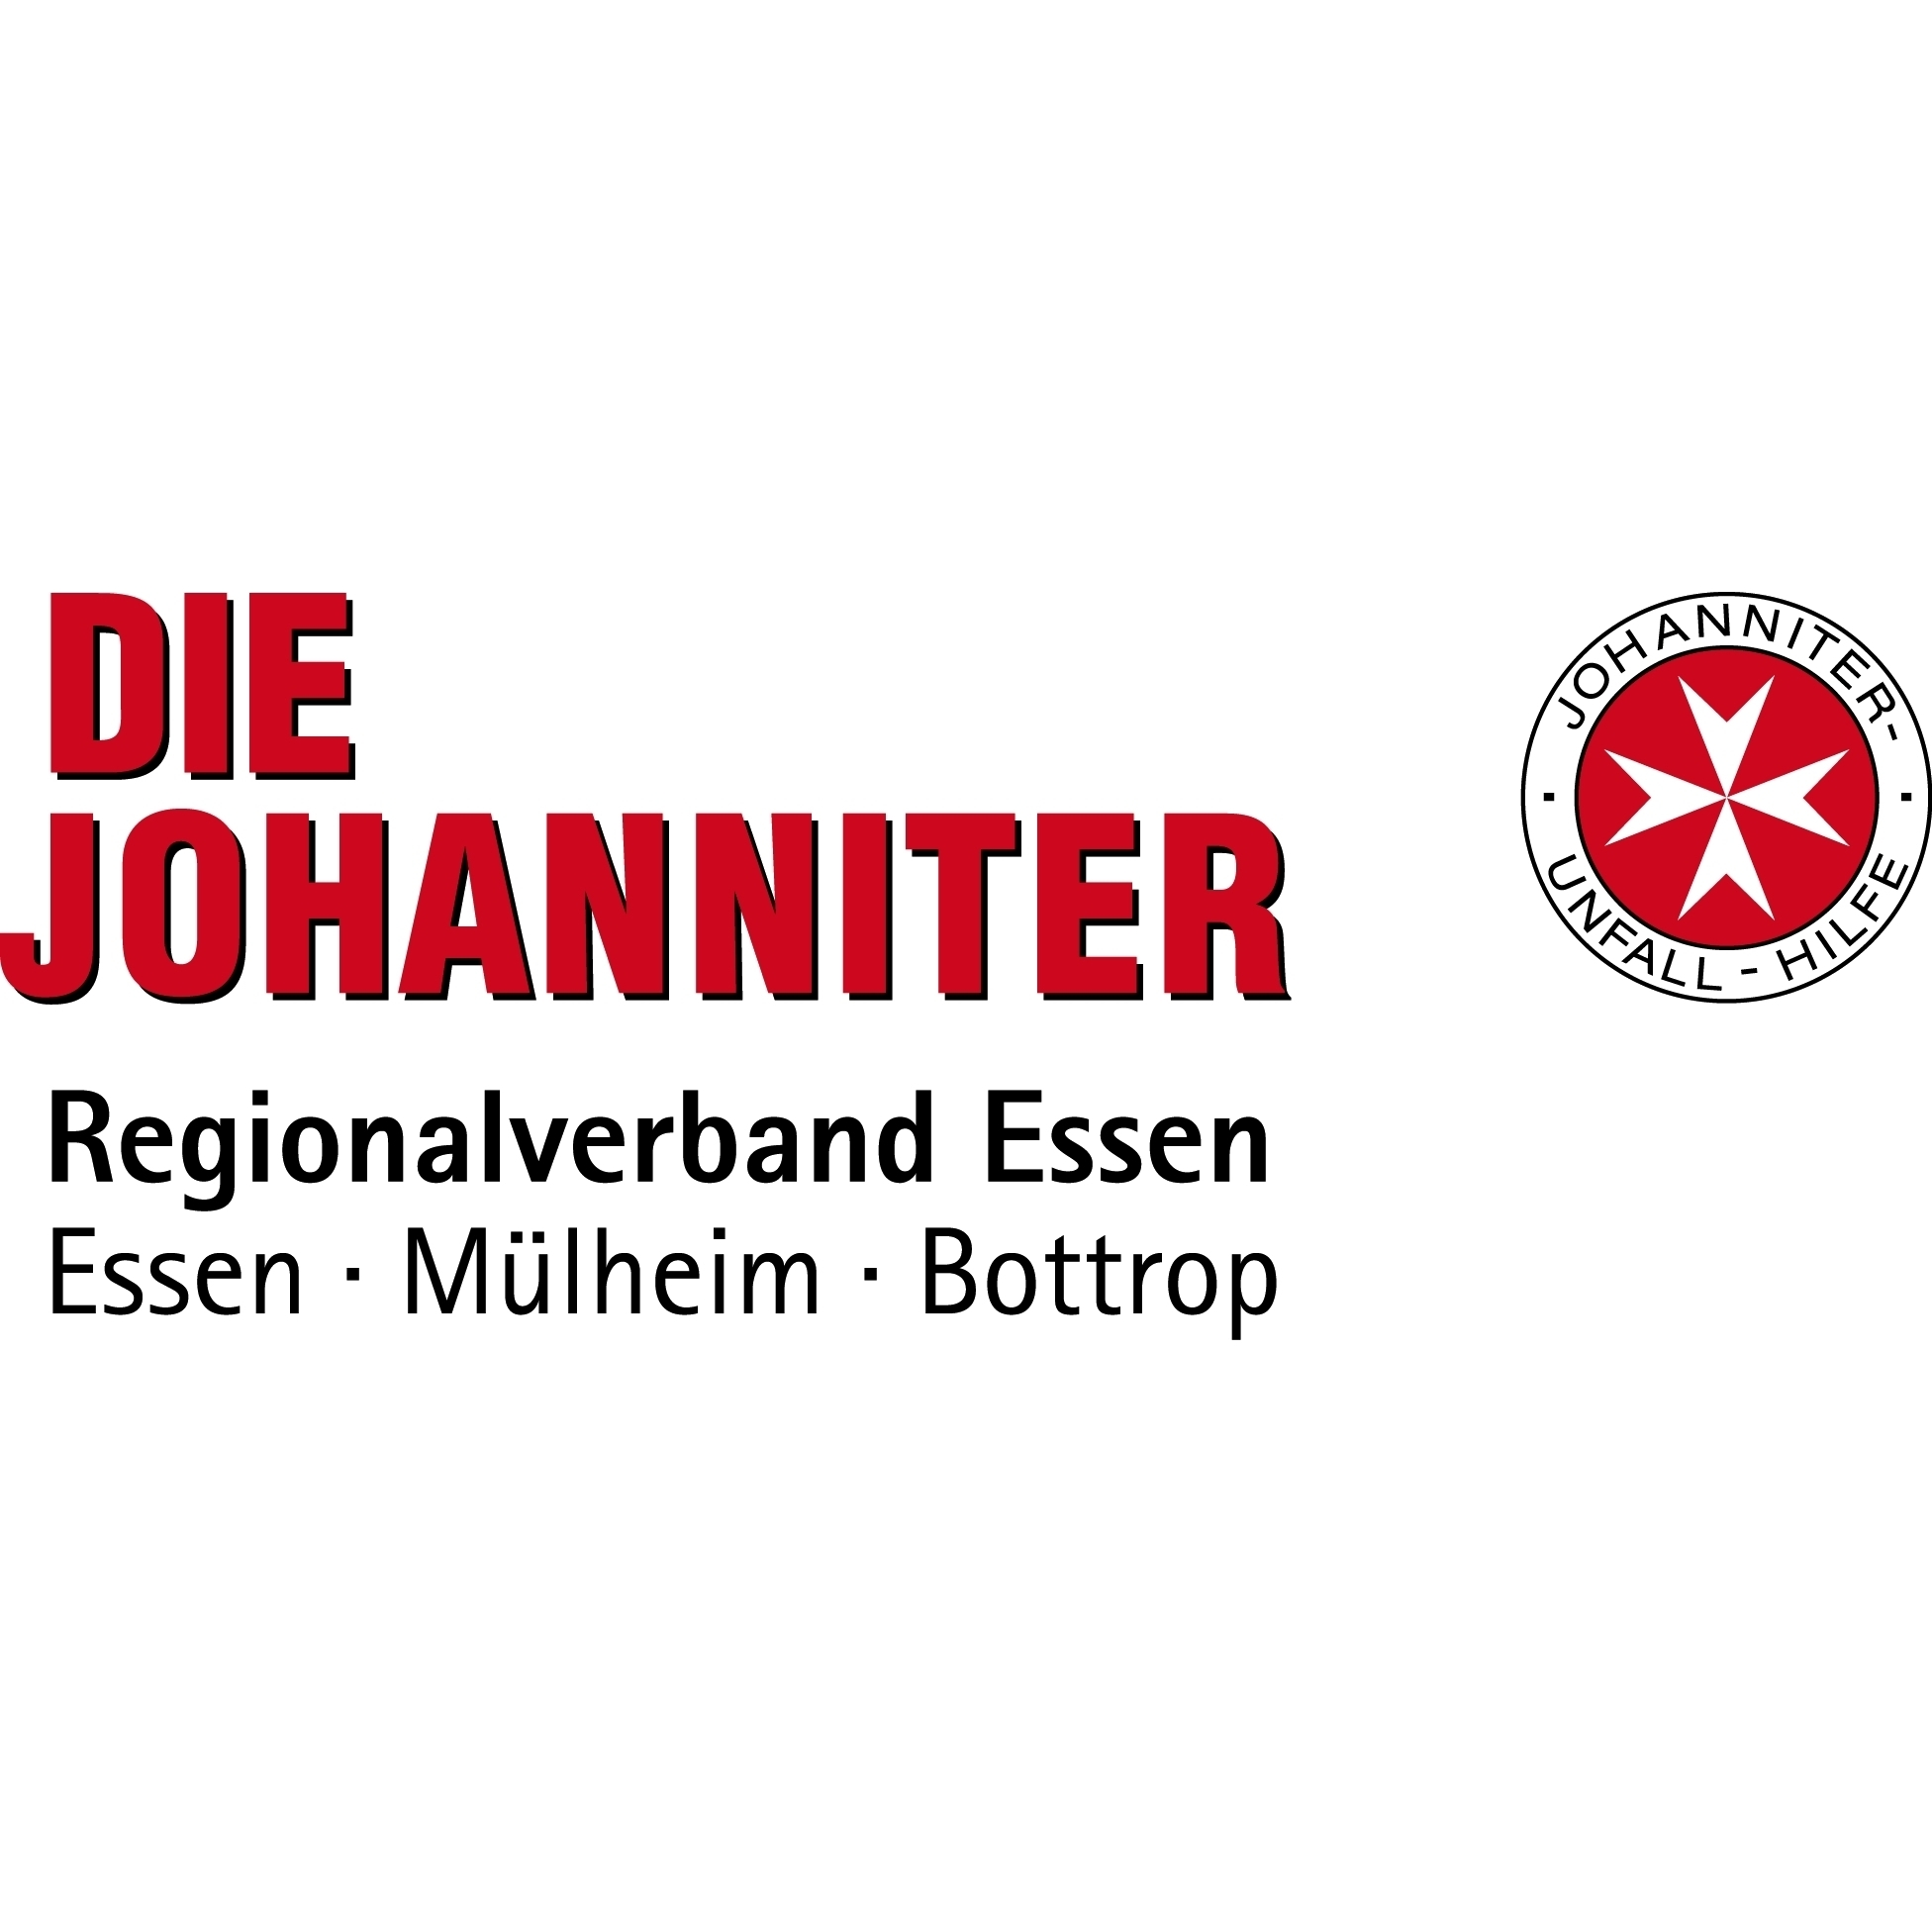 Johanniter-Unfall-Hilfe e.V. Regionalverband Essen